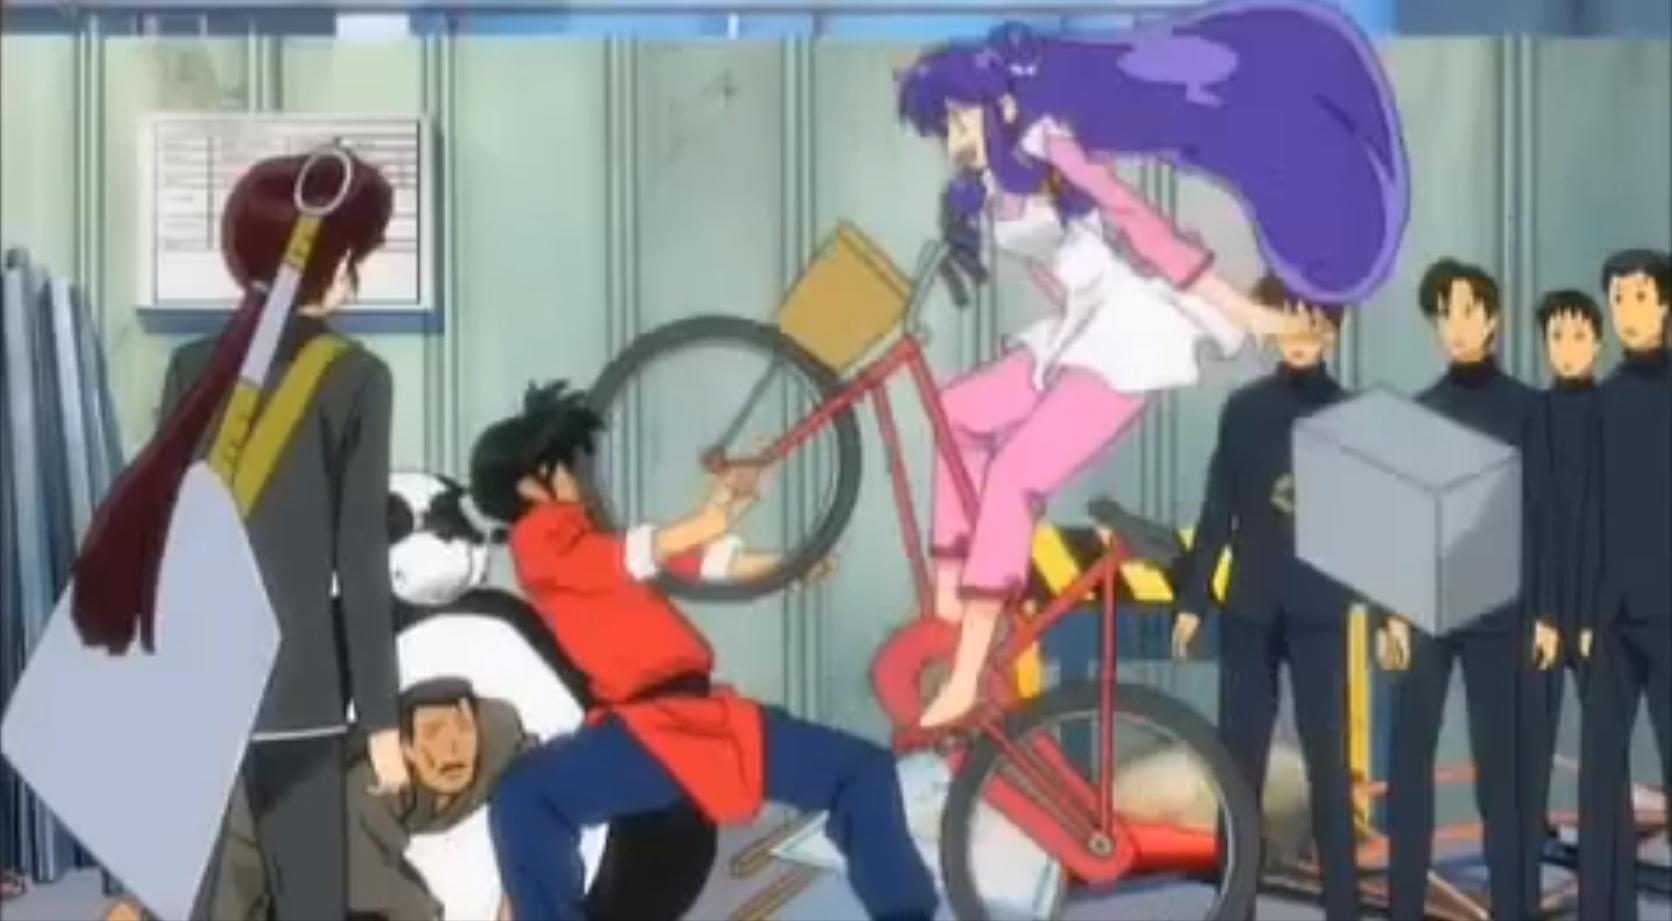 Shampoo's bike